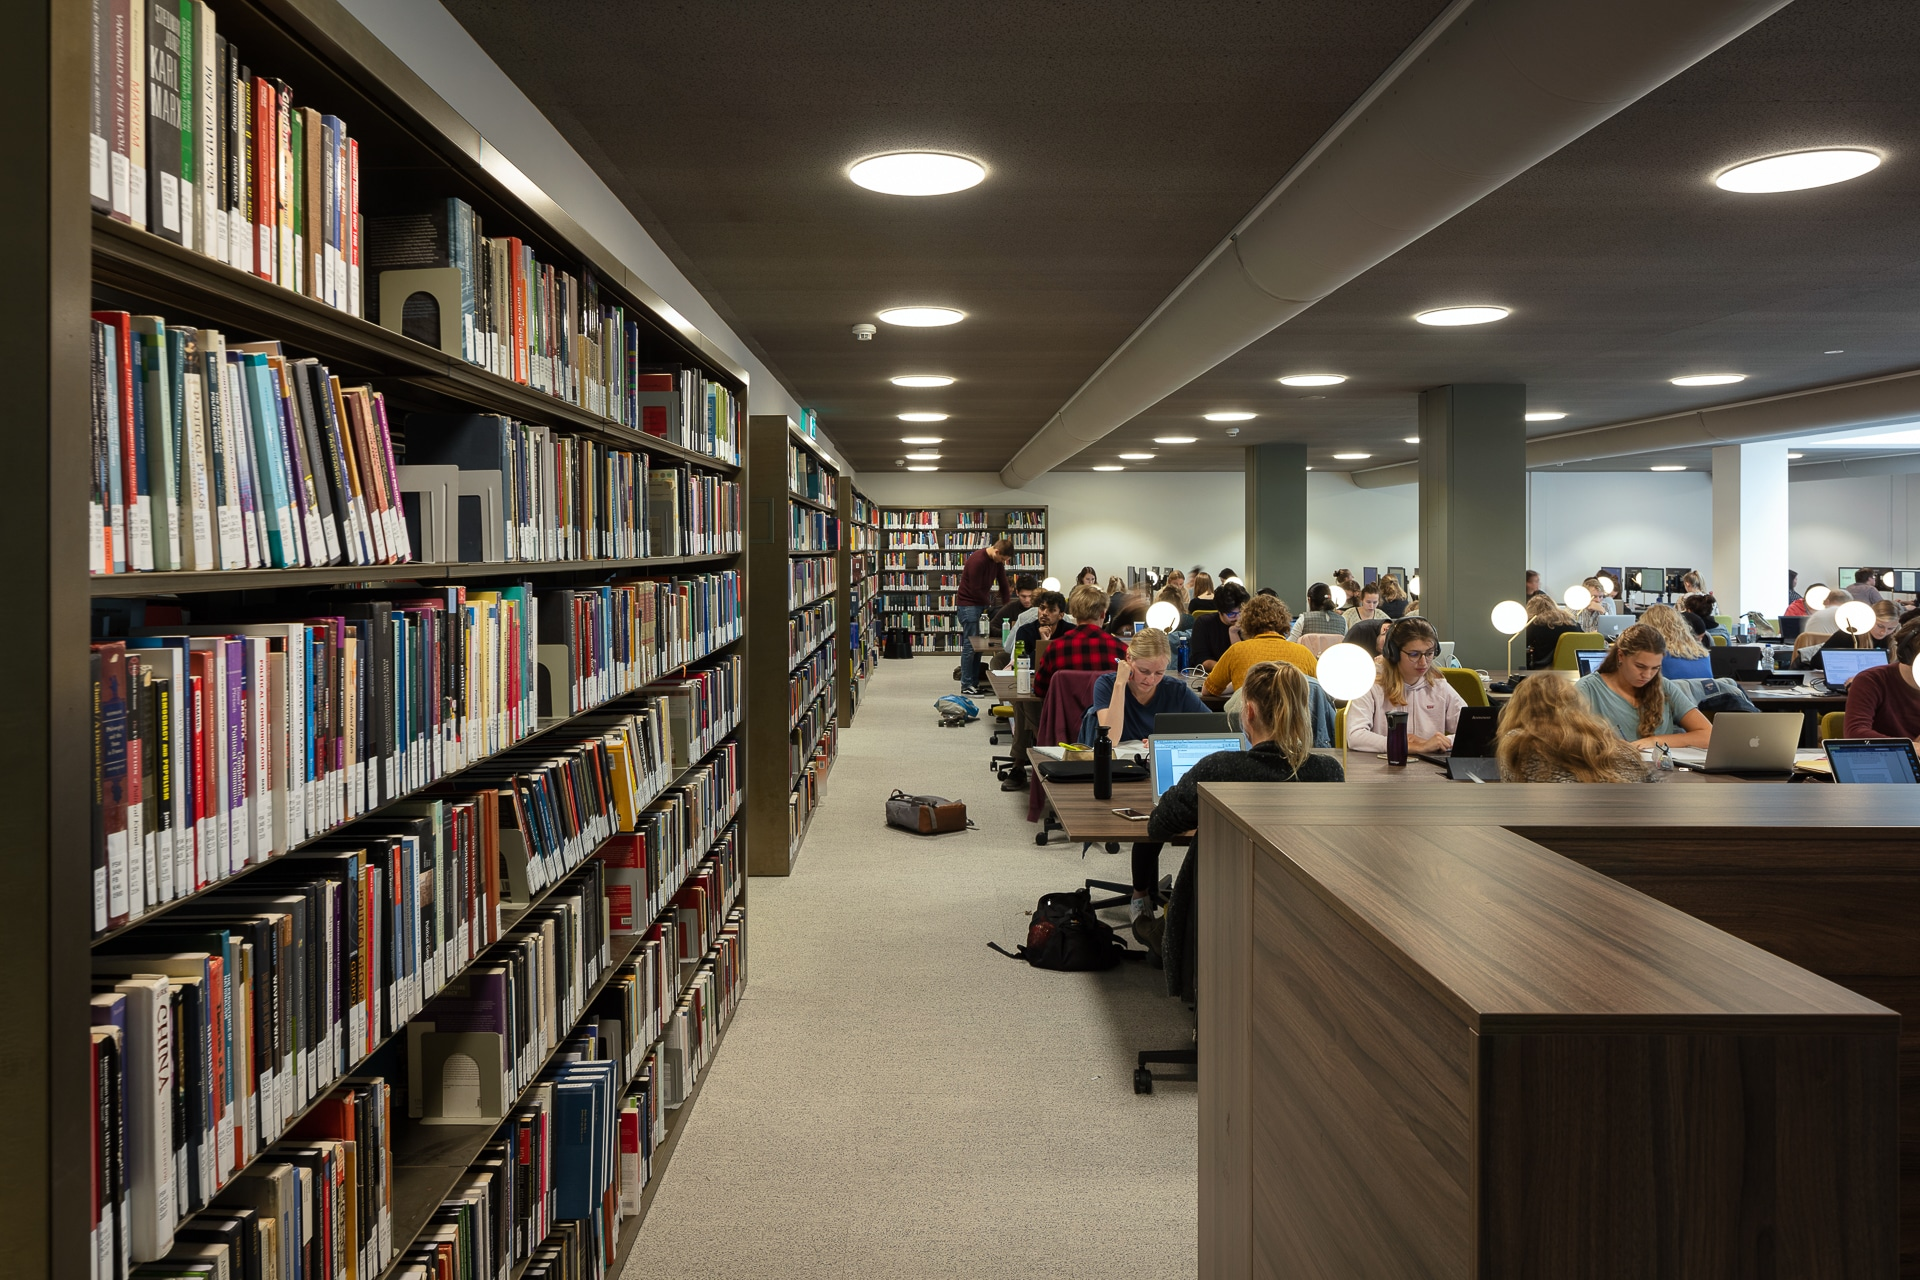 SP2019 Bibliotheek PdlC 4 LowRes